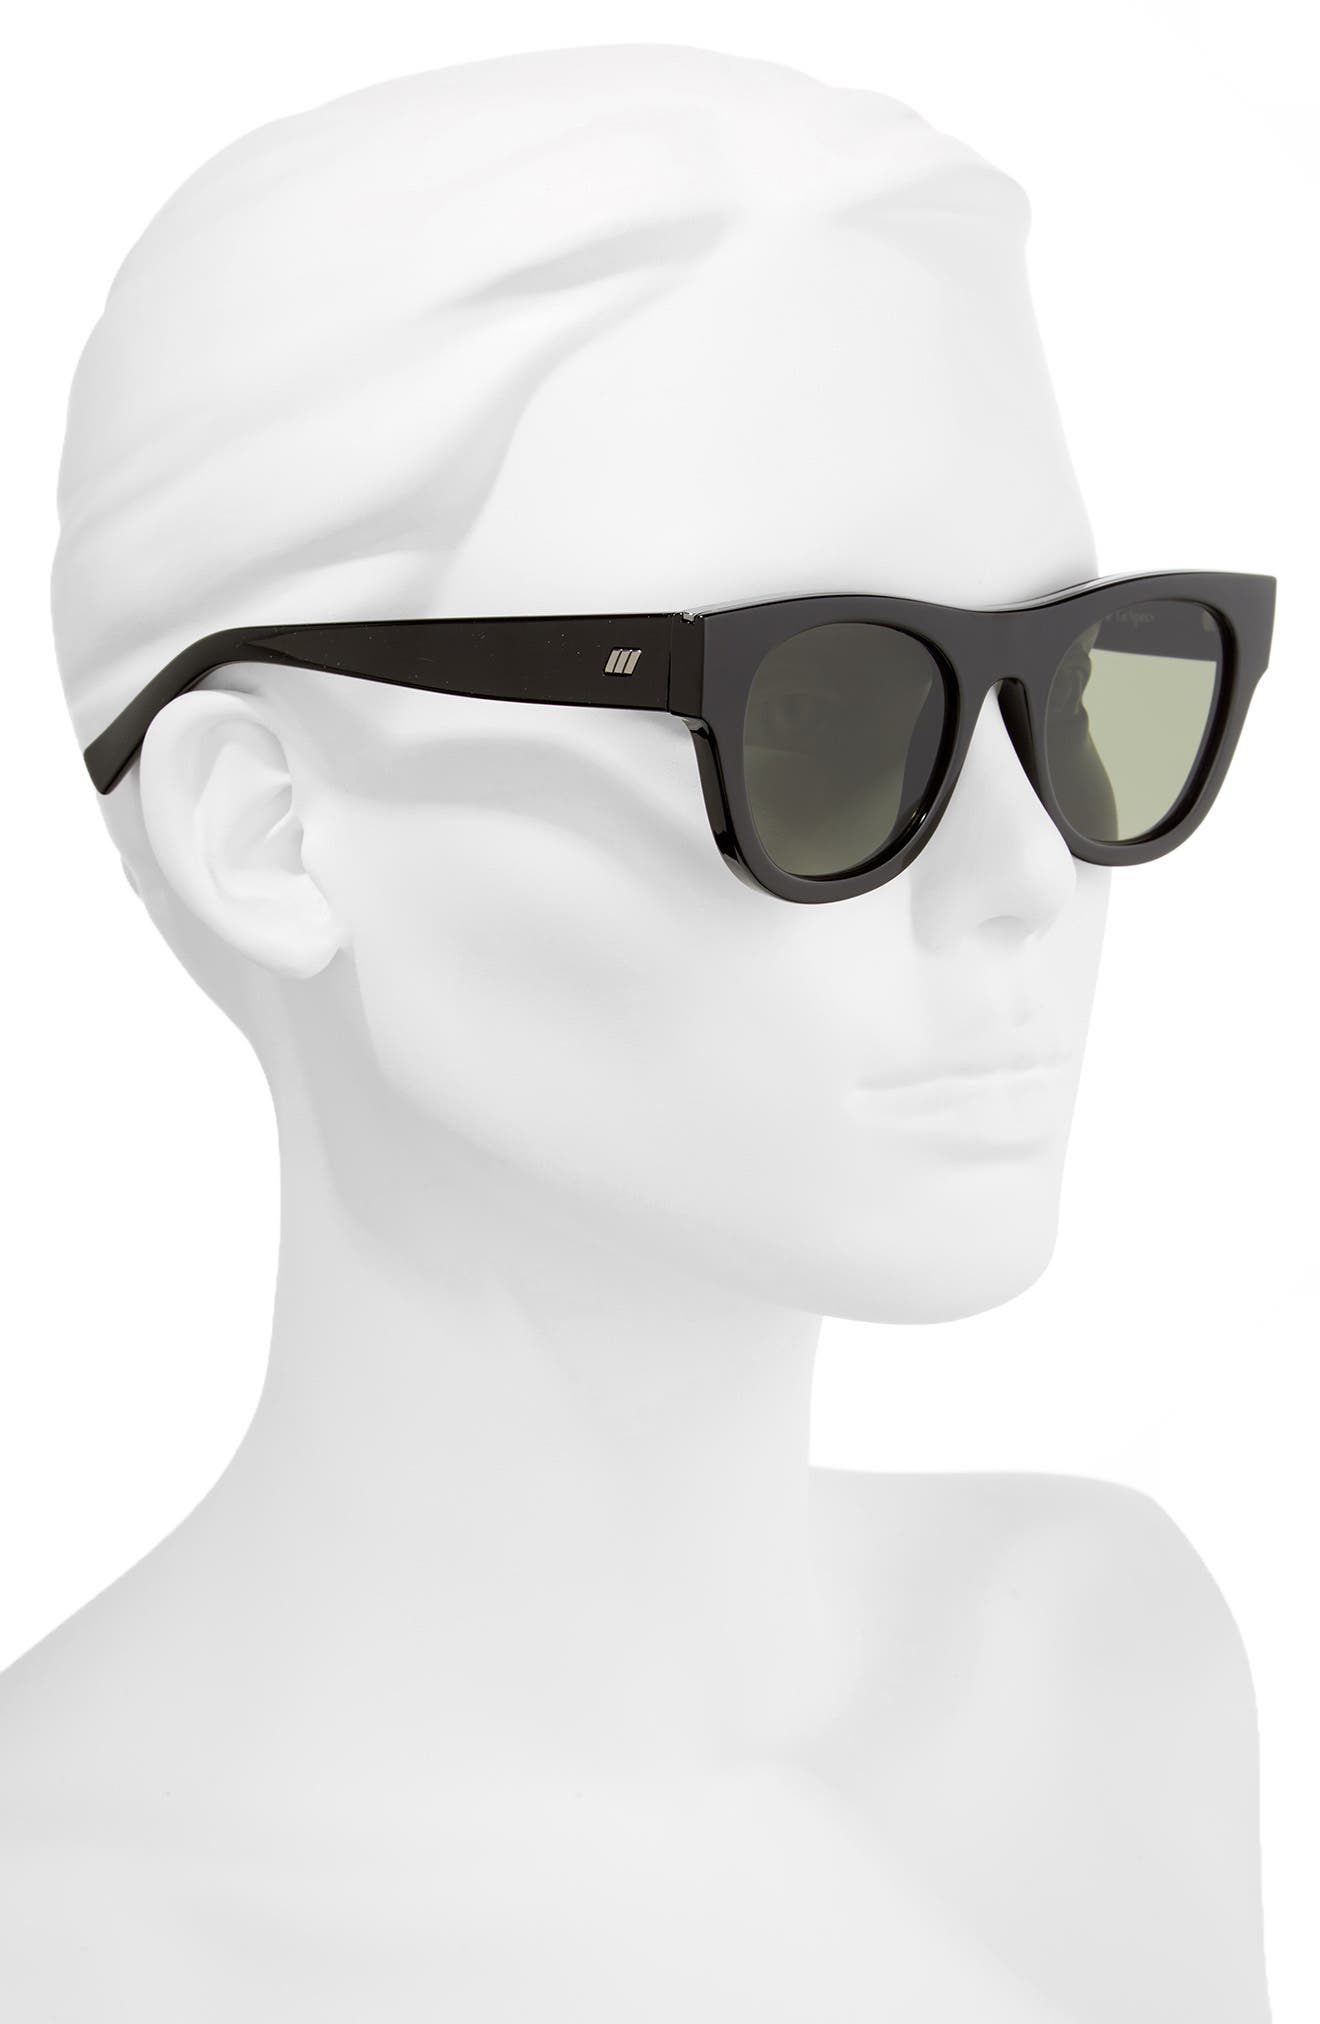 Arcadia 49mm Sunglasses,                             Alternate thumbnail 2, color,                             001